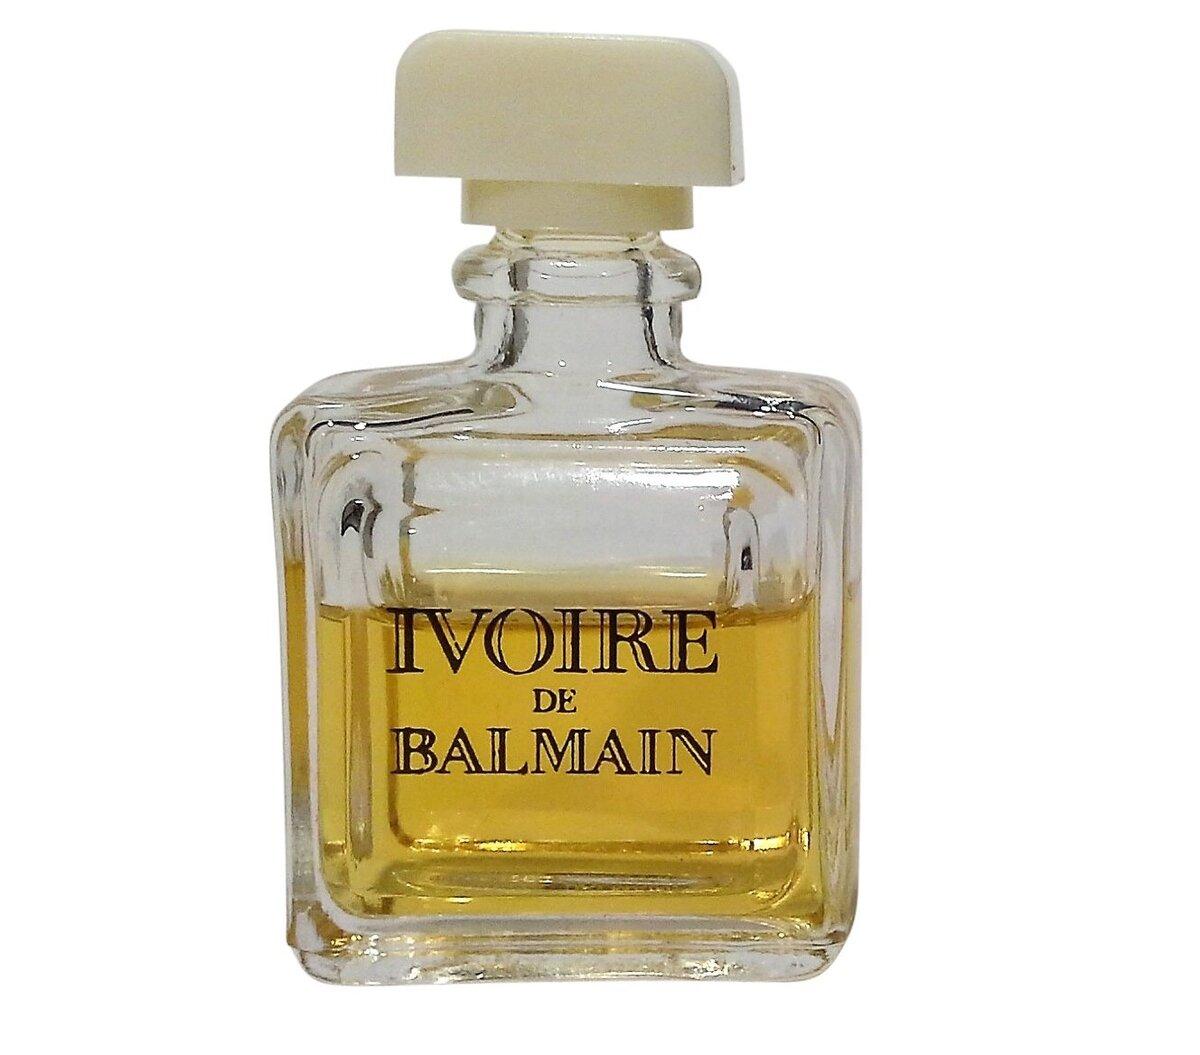 Любимые ароматы Одри Хепберн - Ivoire de Balmain (Pierre Balmain)